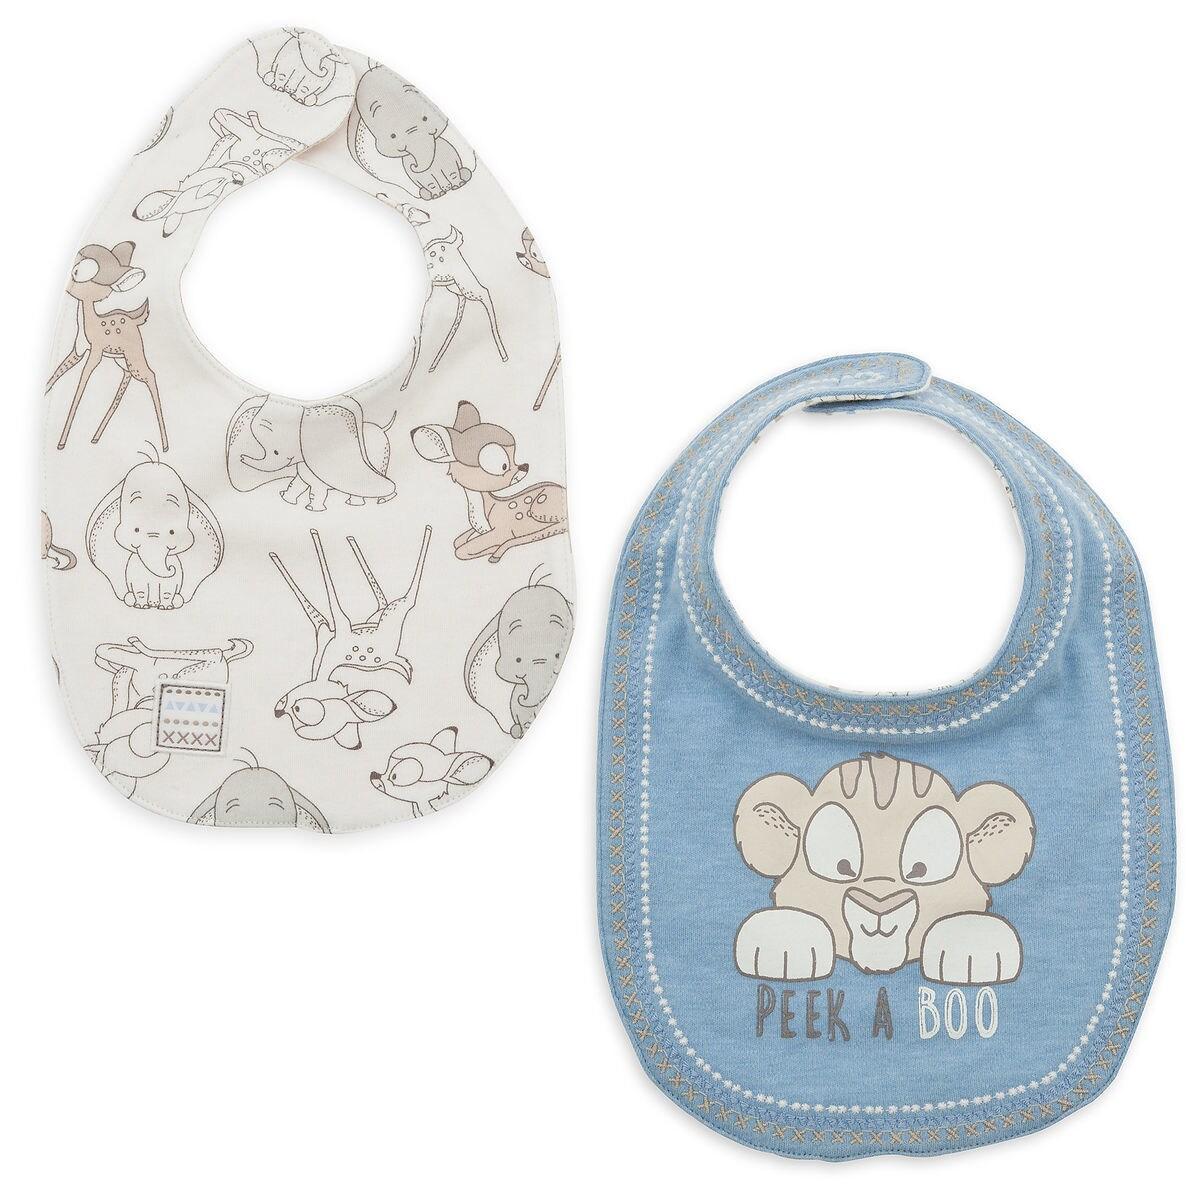 Product Image of Disney Classics Reversible Bib Set for Baby # 1